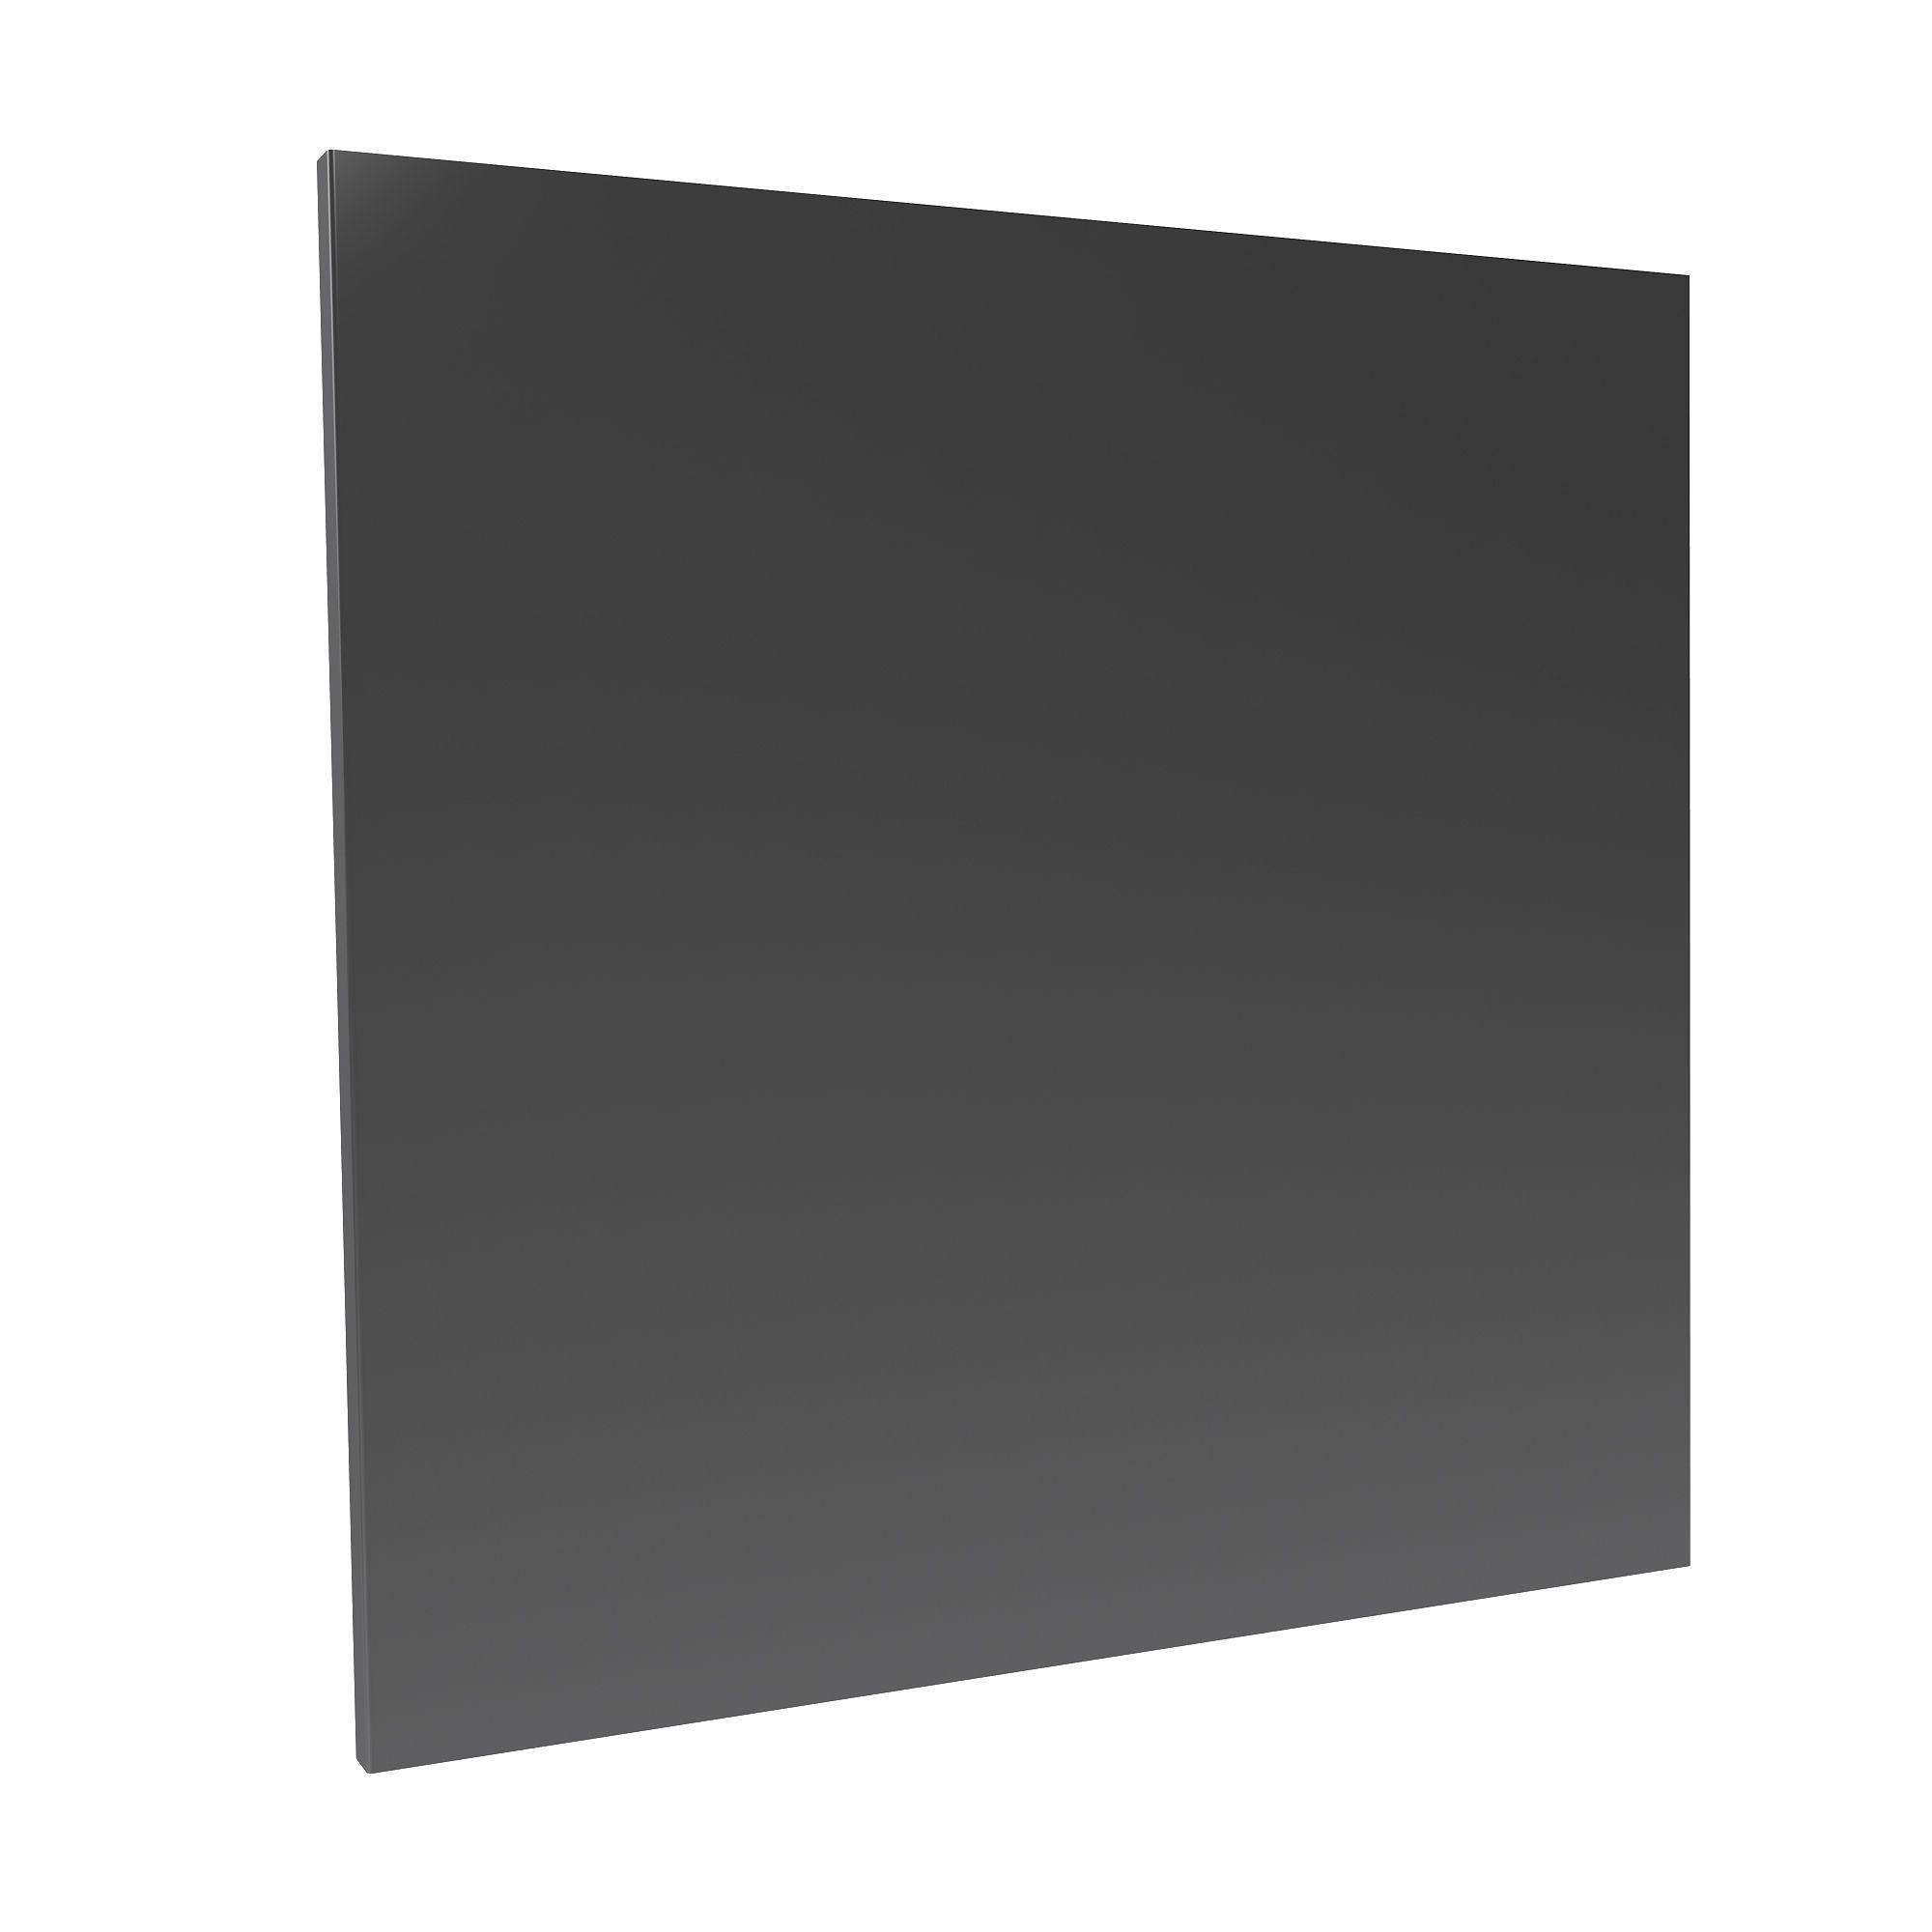 Darwin Modular Anthracite Bedside Cabinet Door (h)478mm (w)497mm